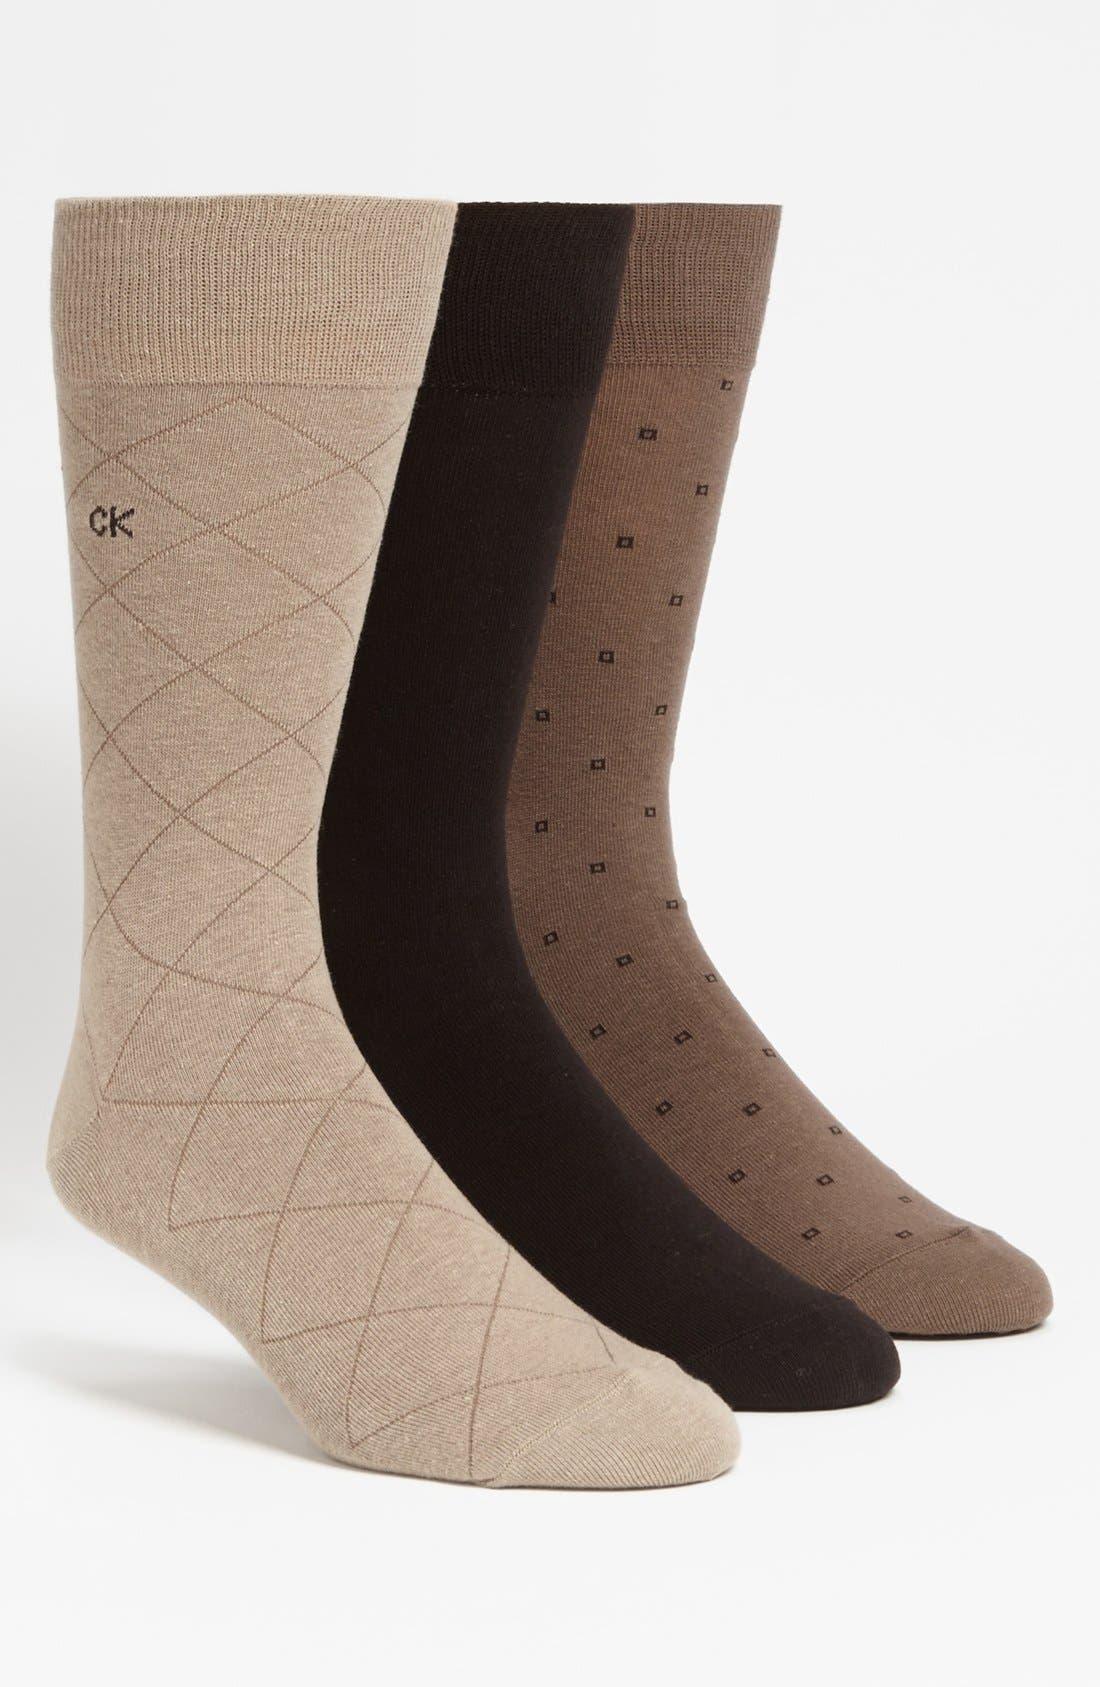 Main Image - Calvin Klein 3-Pack Patterned Socks